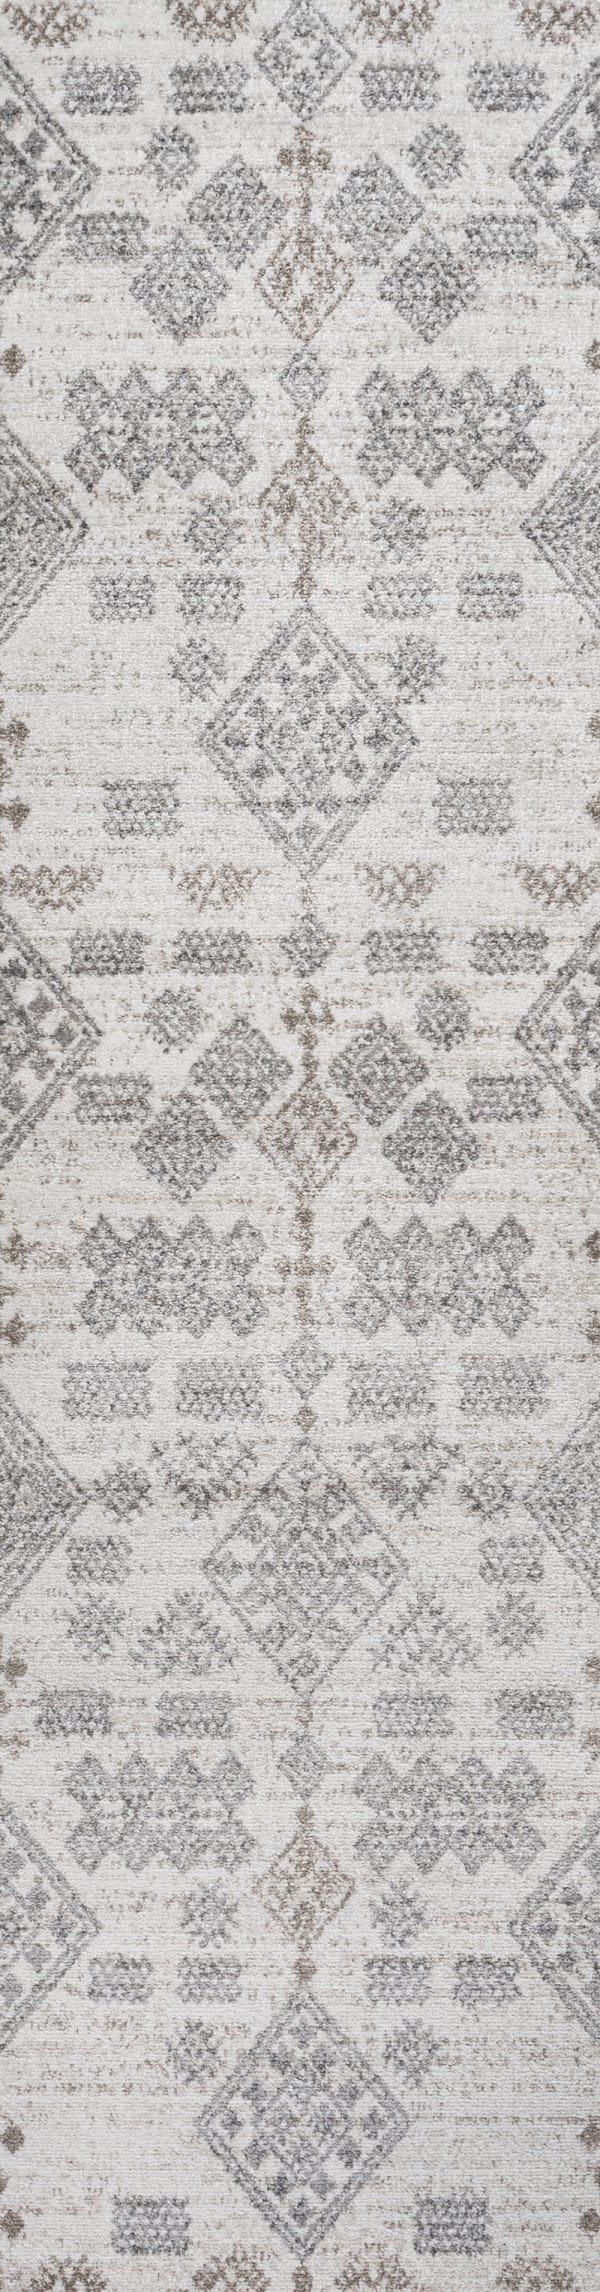 Berber Diamond Geometric Beige/Gray 2' x 8' Runner Rug